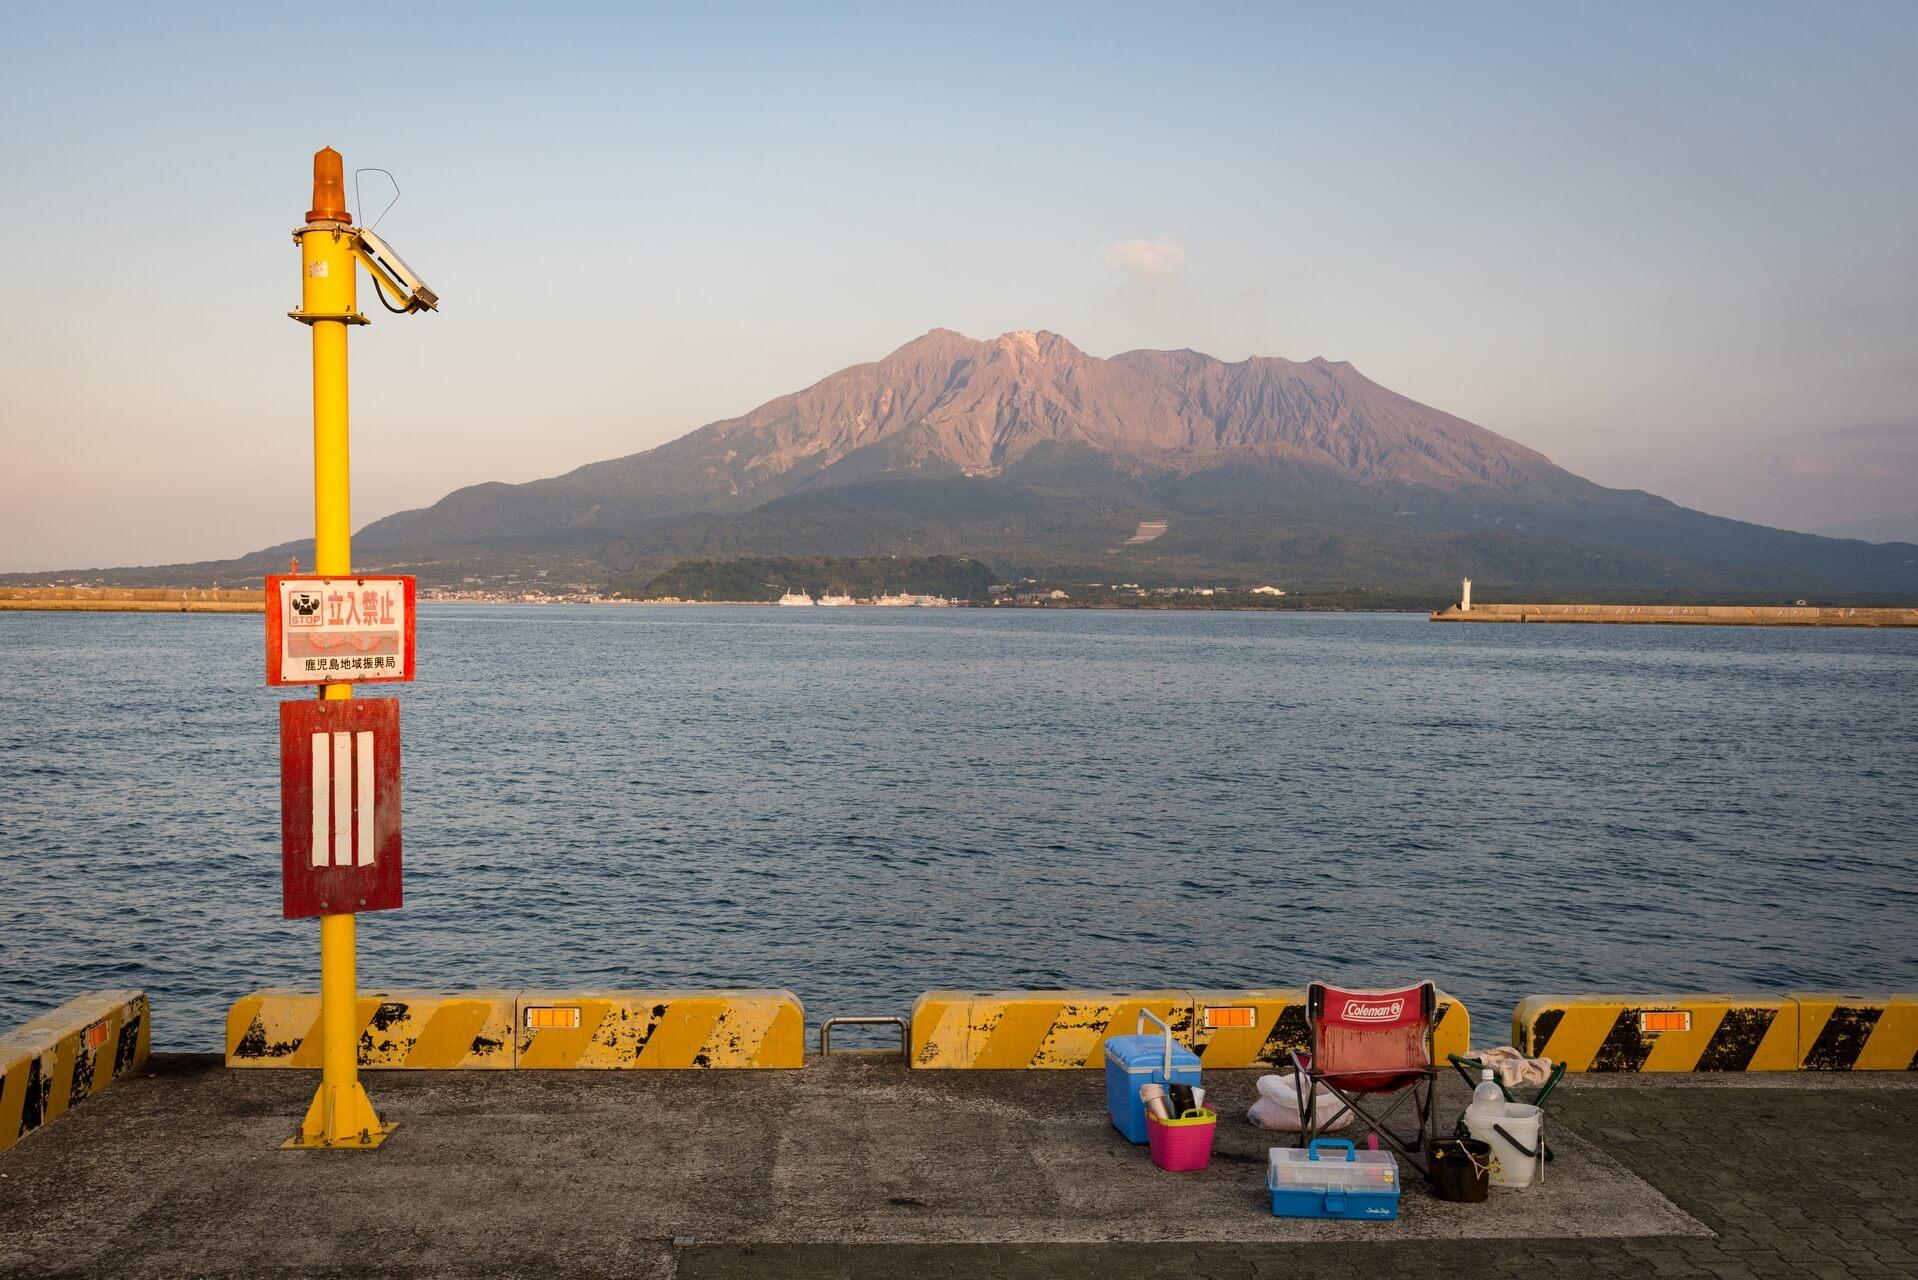 Japan Kagoshima Harbour, Fotograf: Steffen Lohse